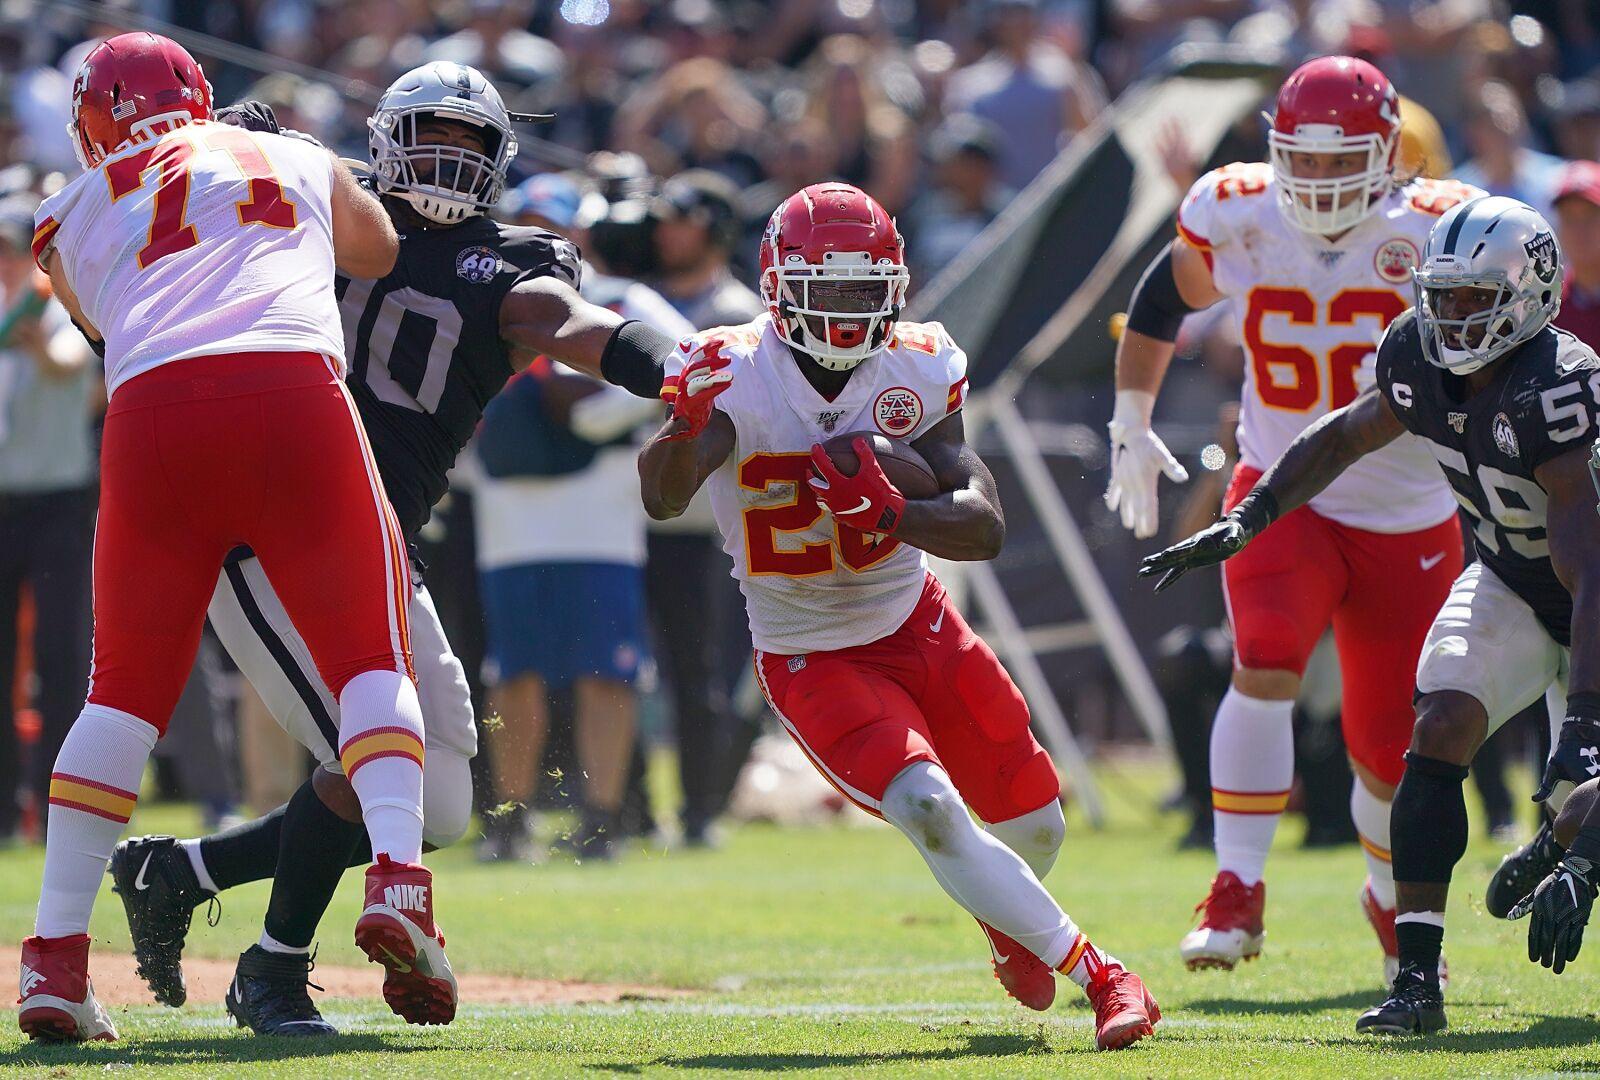 Kansas City Chiefs need to improve rushing attack